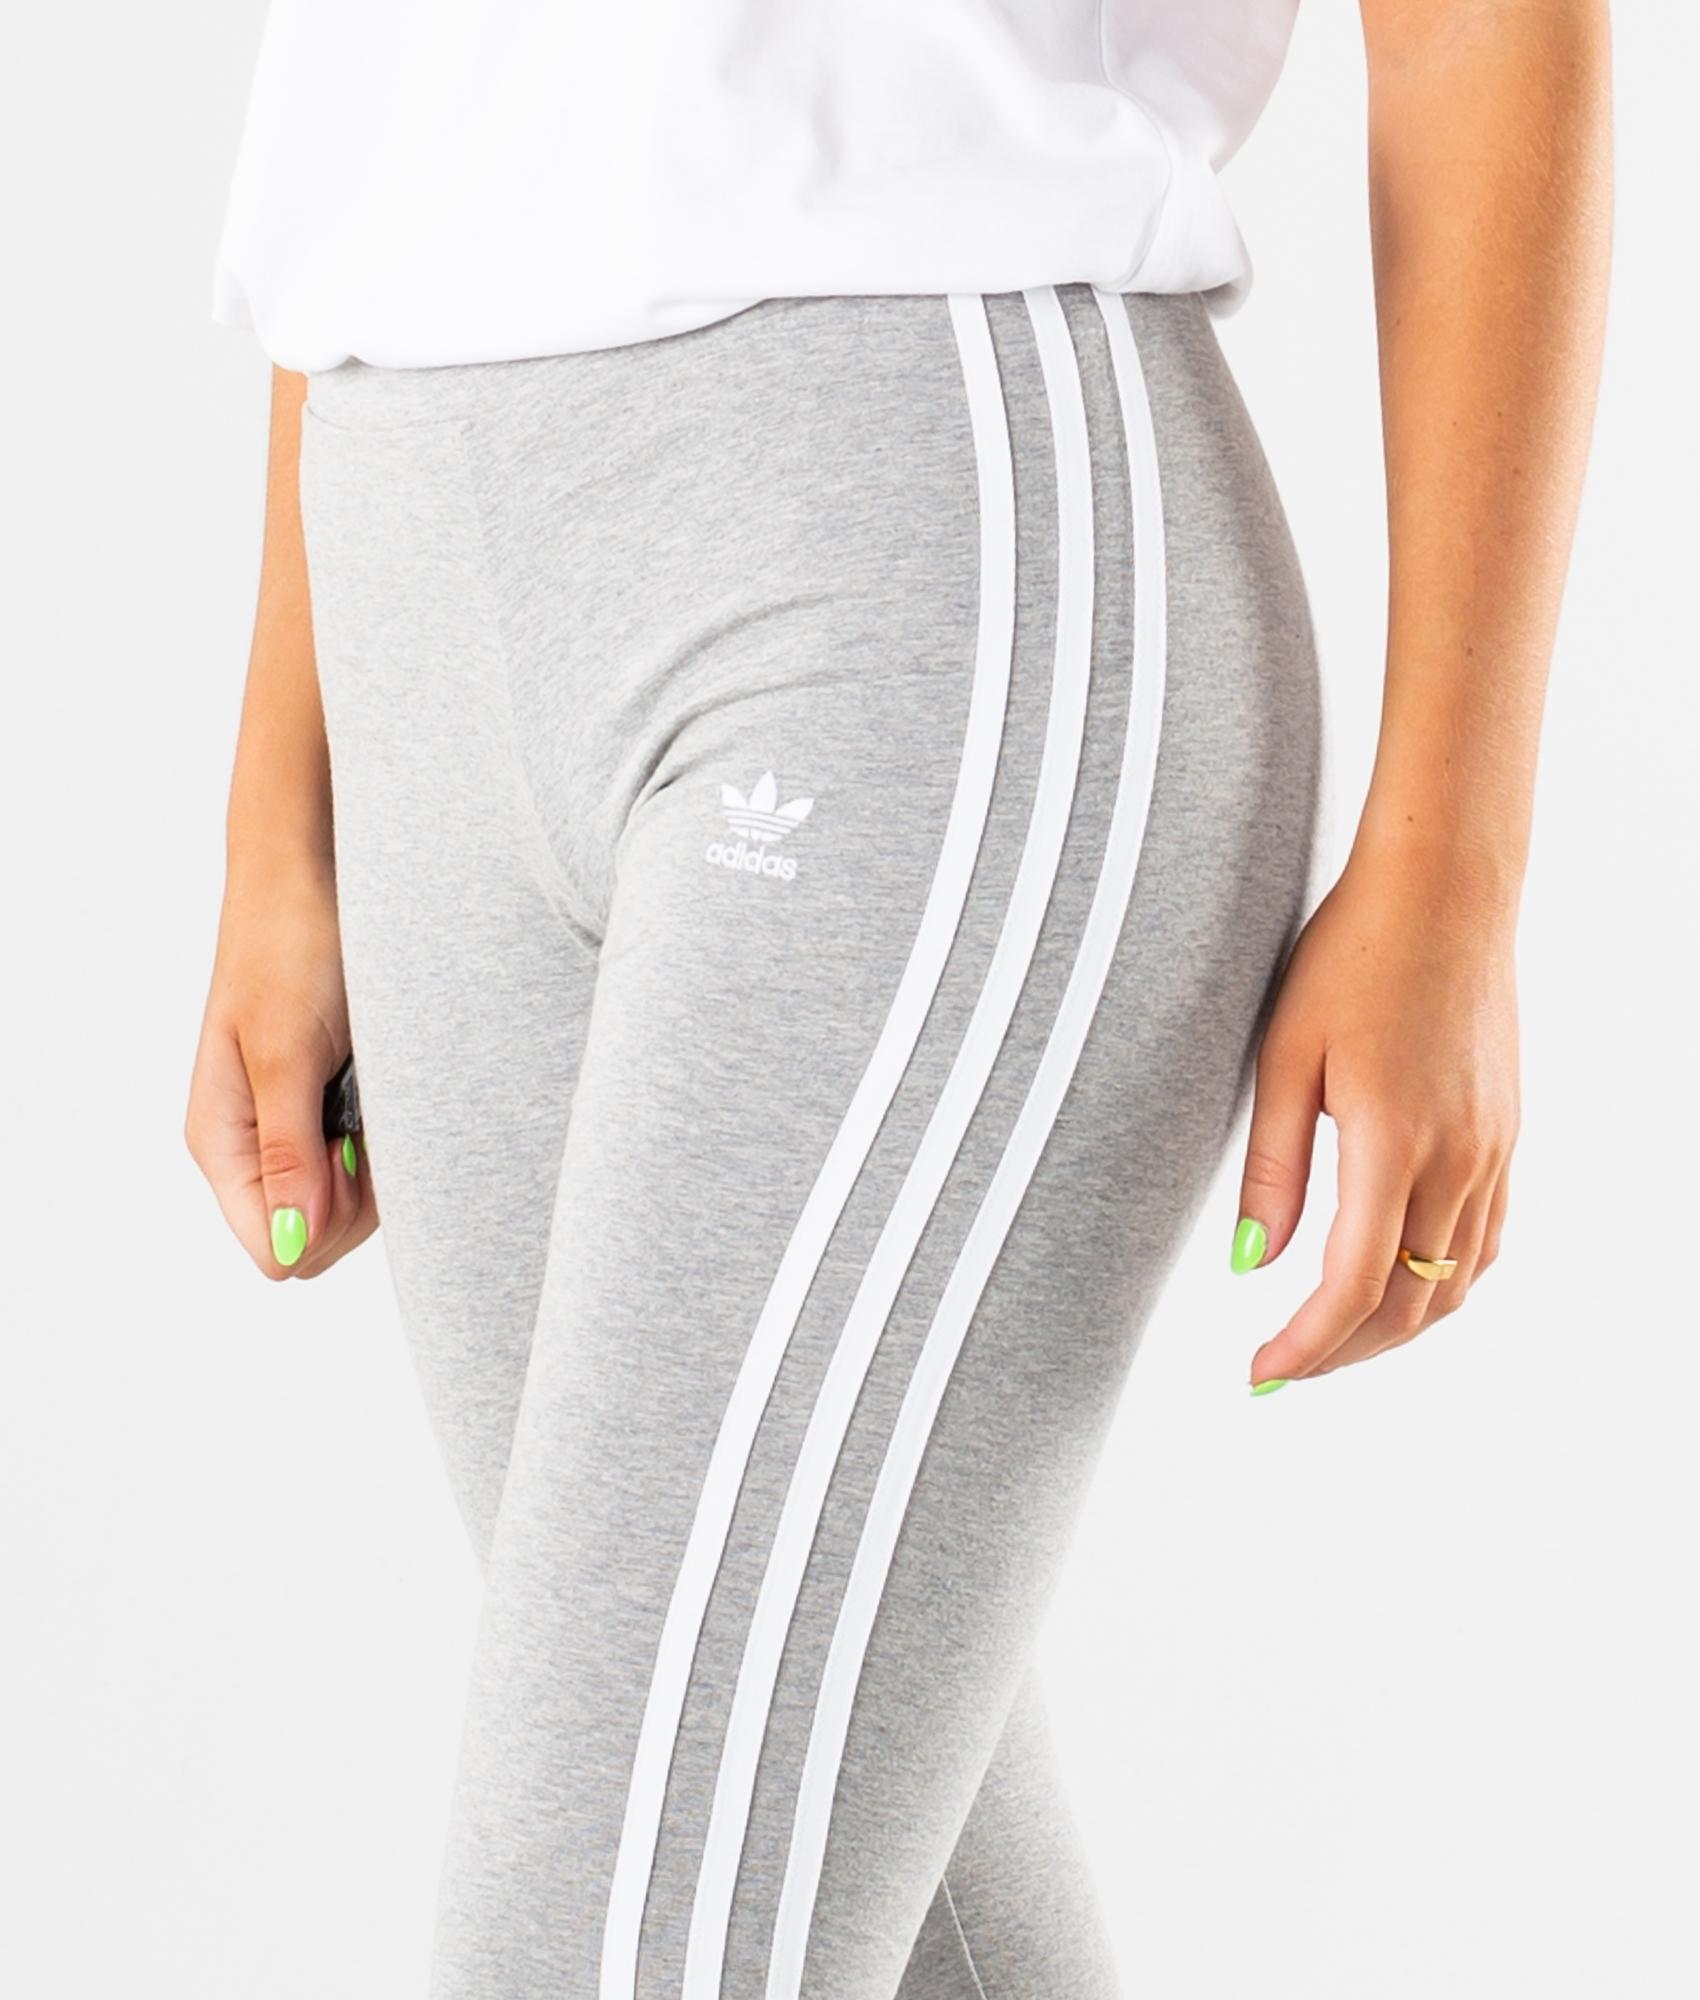 Adidas 3 Stripes Tights Medium Grey HeatherWhite